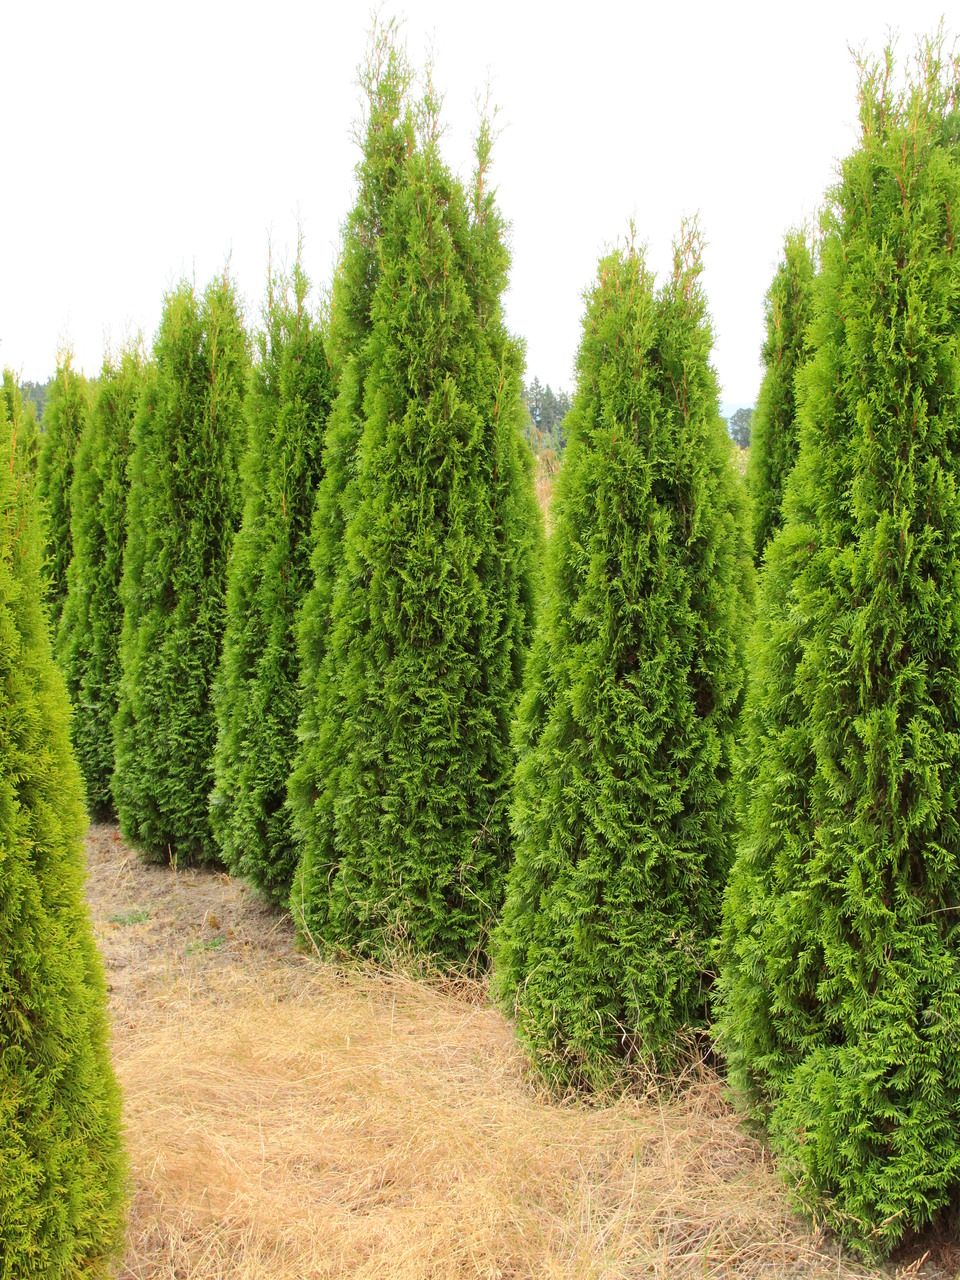 Thuja Occidentalis Smaragd Emerald Green Arborvitae Instanthedge 10 Linear Feet Emerald Green Arborvitae Thuja Occidentalis Arborvitae